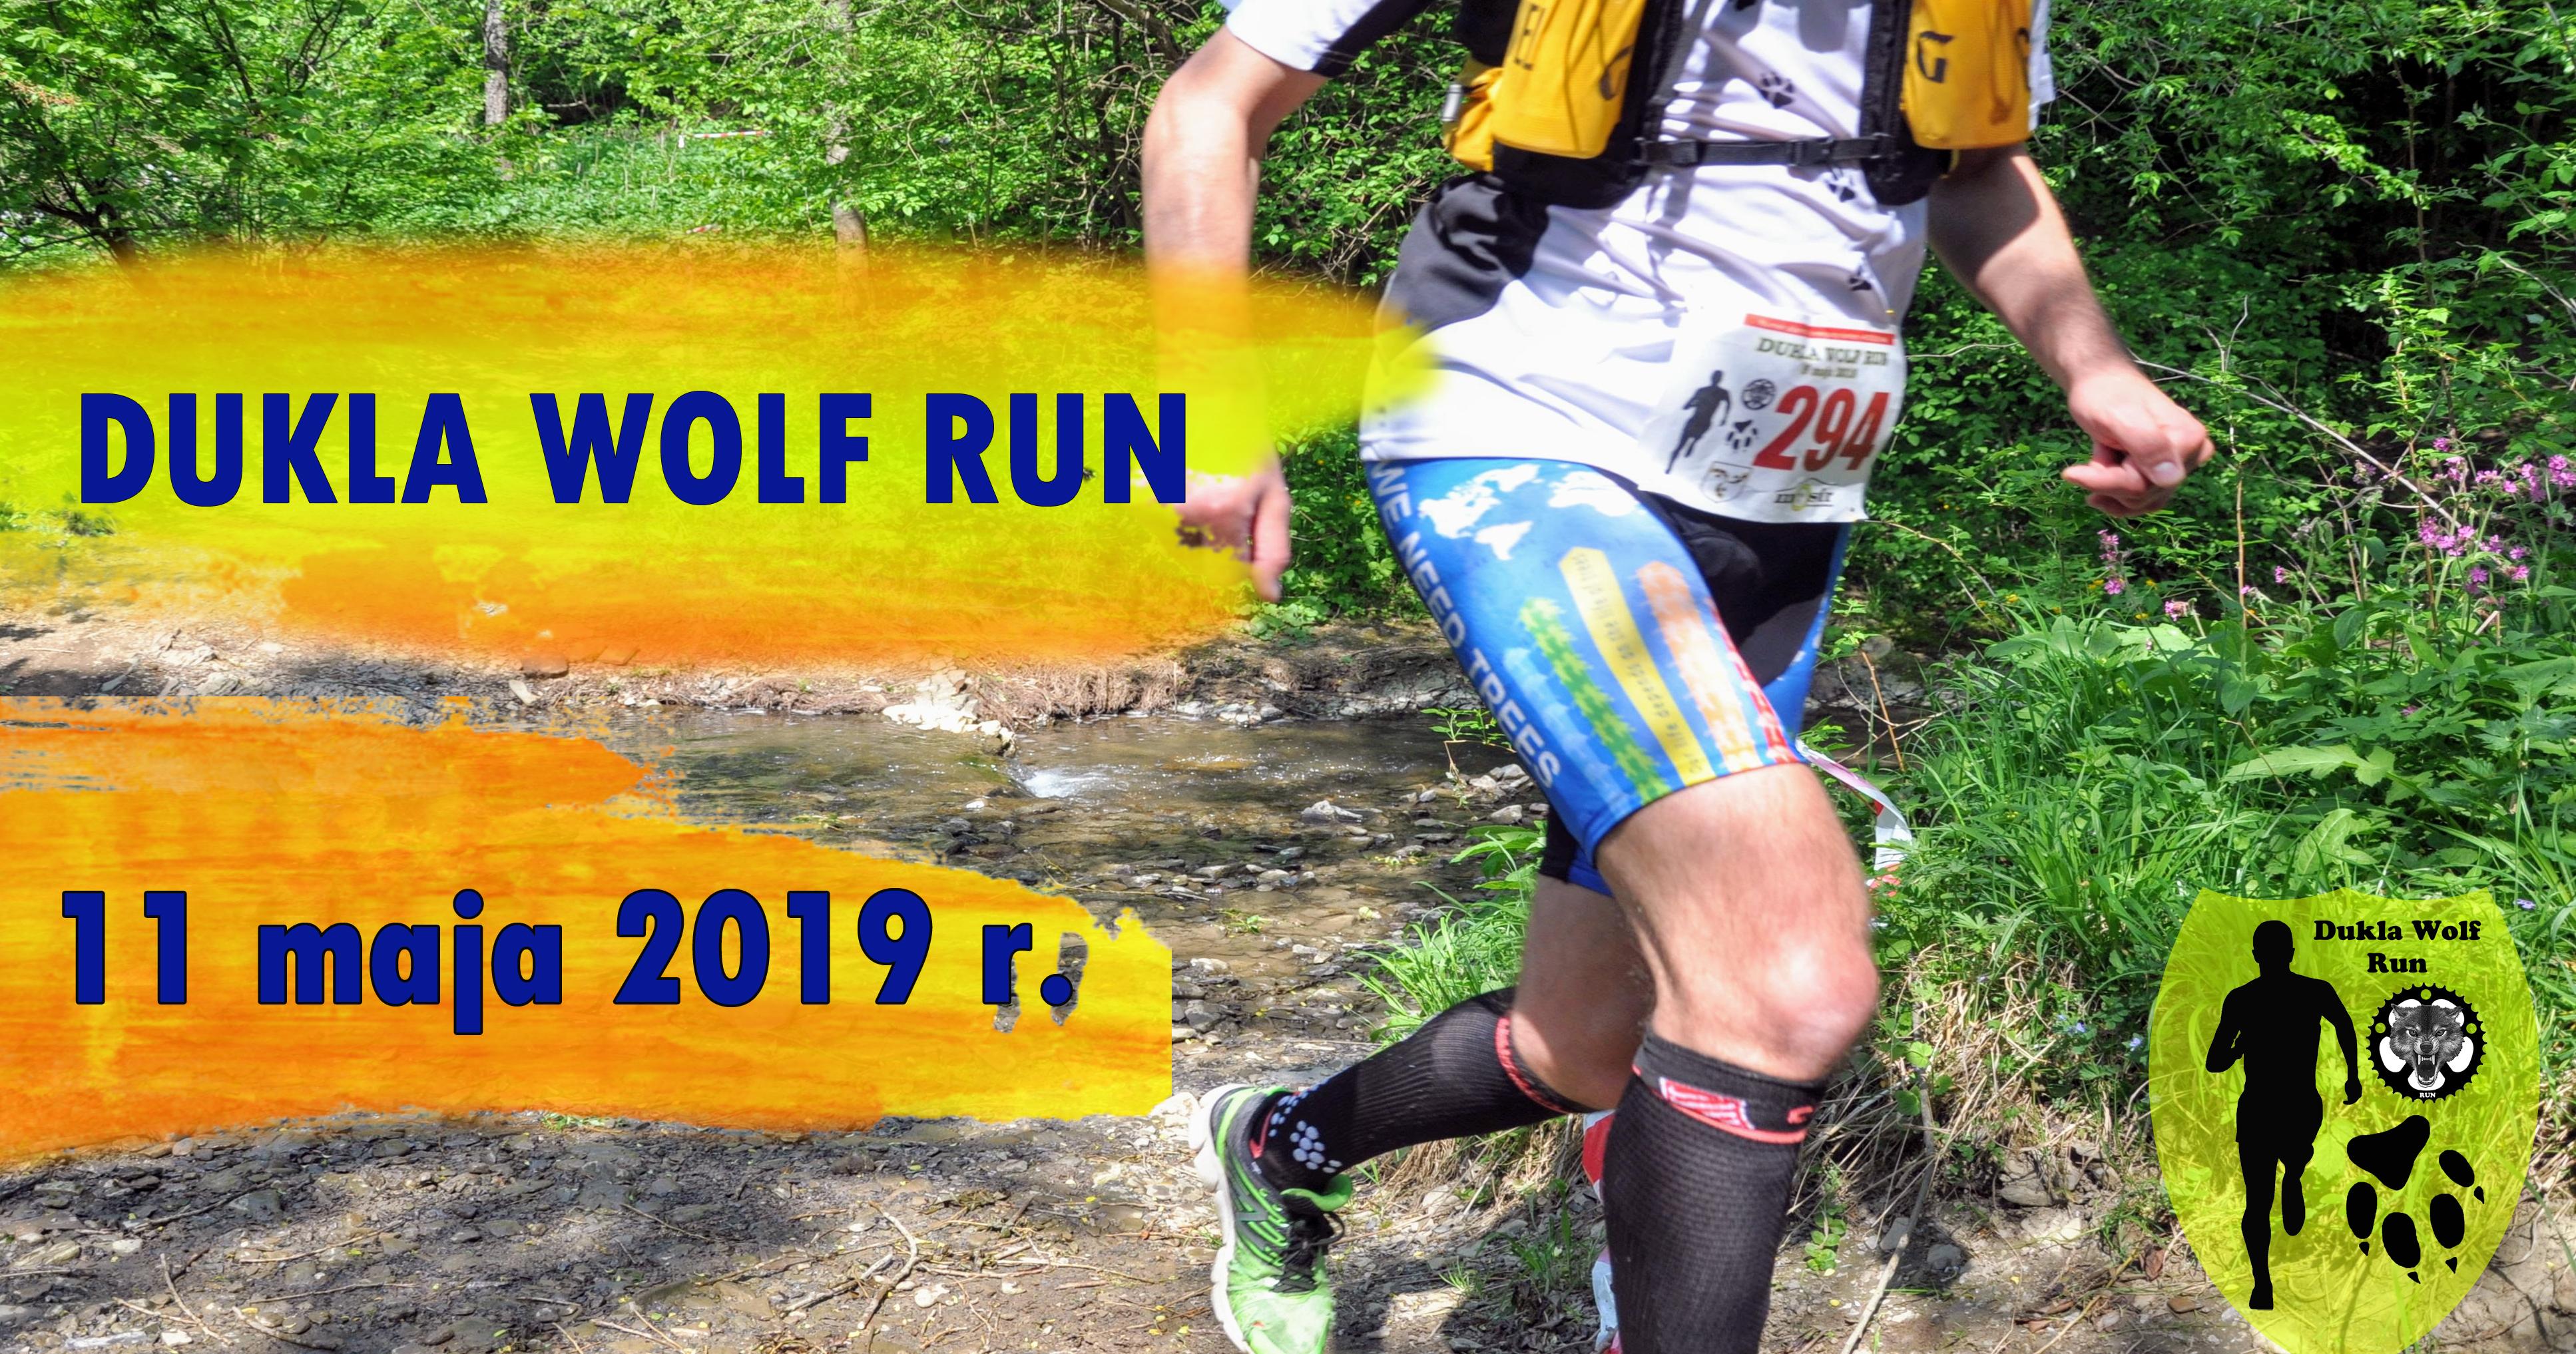 baner Dukla wolf run 2019